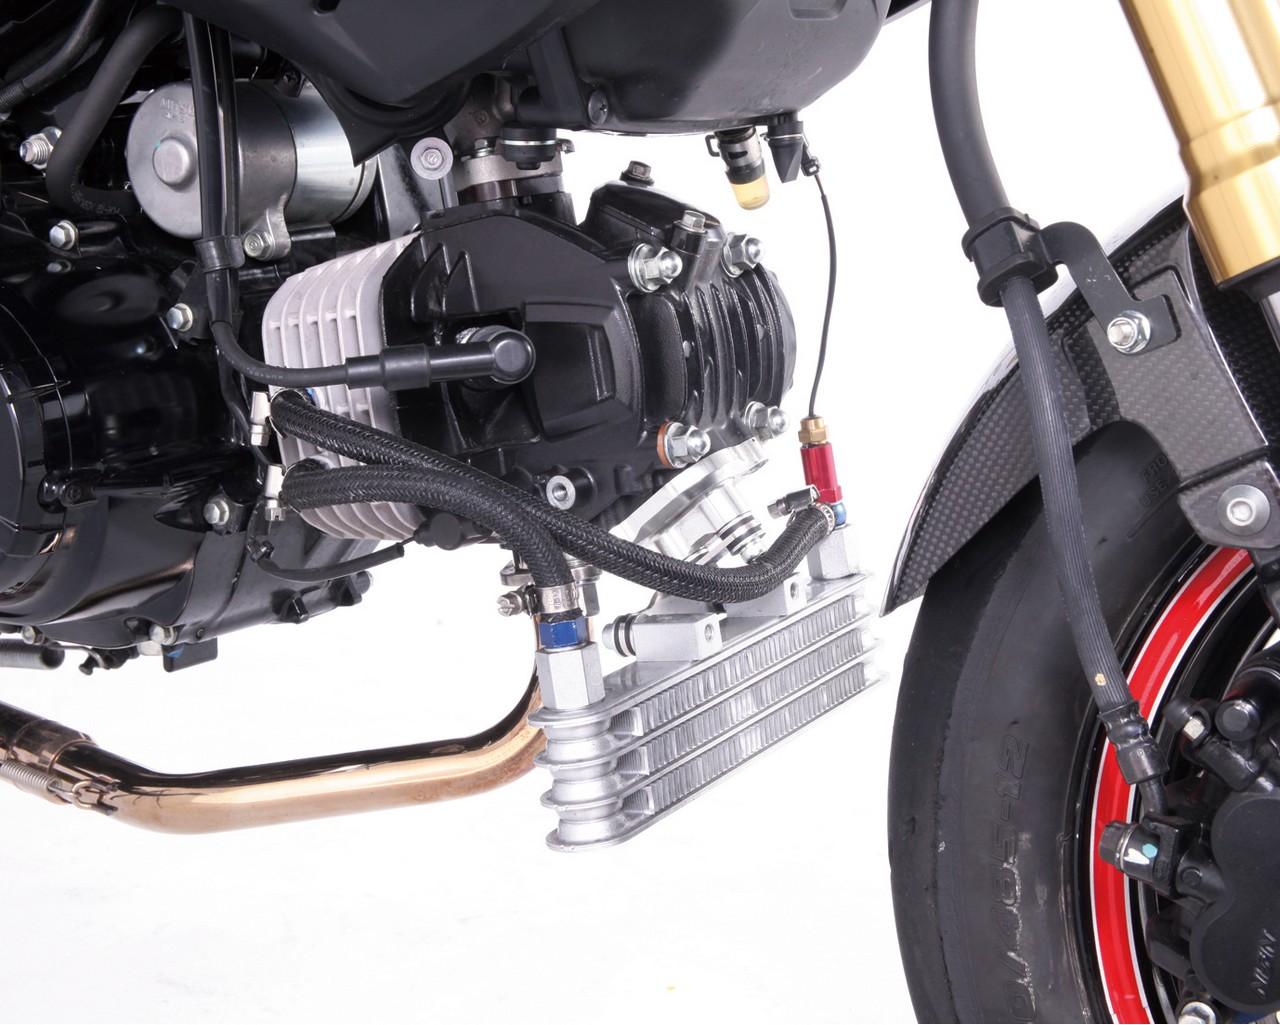 【KITACO】機油冷卻器套件 - 「Webike-摩托百貨」